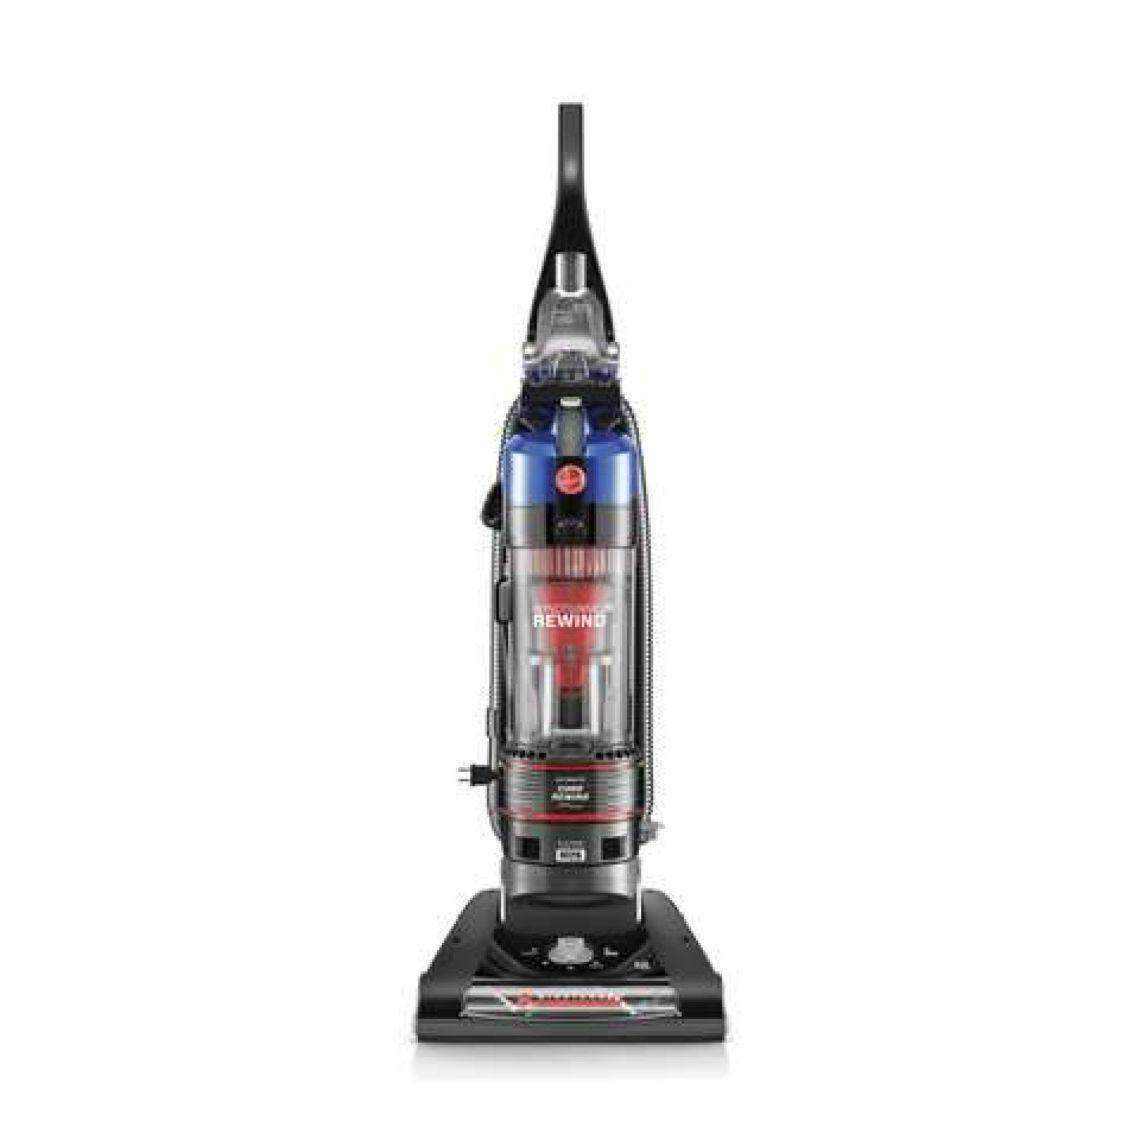 Hoover WindTunnel 2 Rewind Bagless Upright Vacuum Cleaner, UH70825 73502040973 | eBay